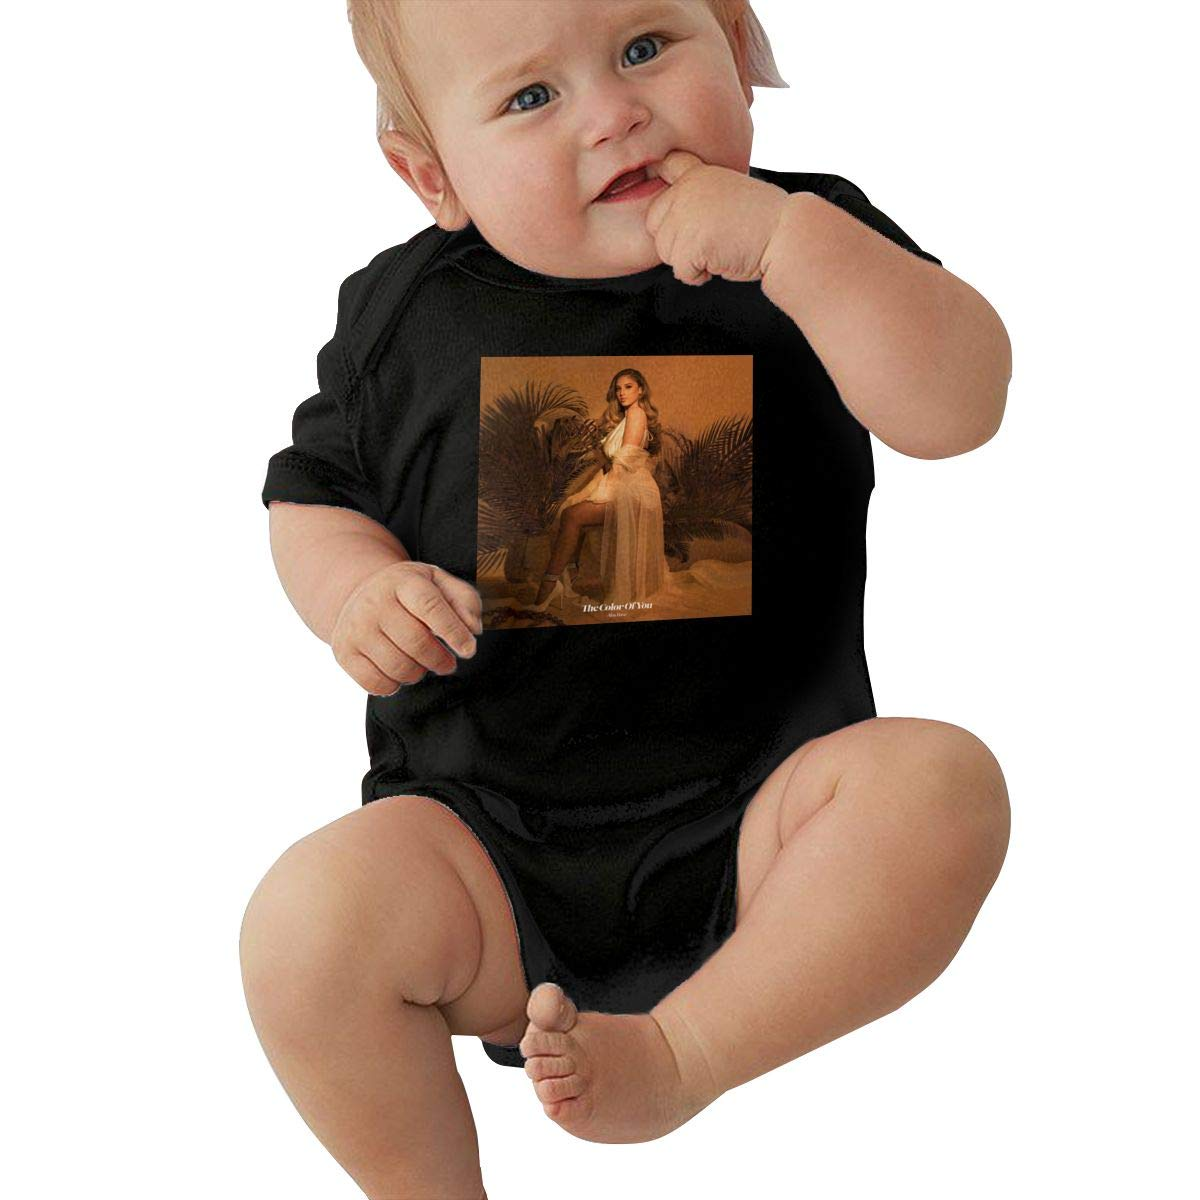 SusanHuling Alina Baraz Unisex Baby Boys Girls Romper Bodysuit Infant Funny Jumpsuit